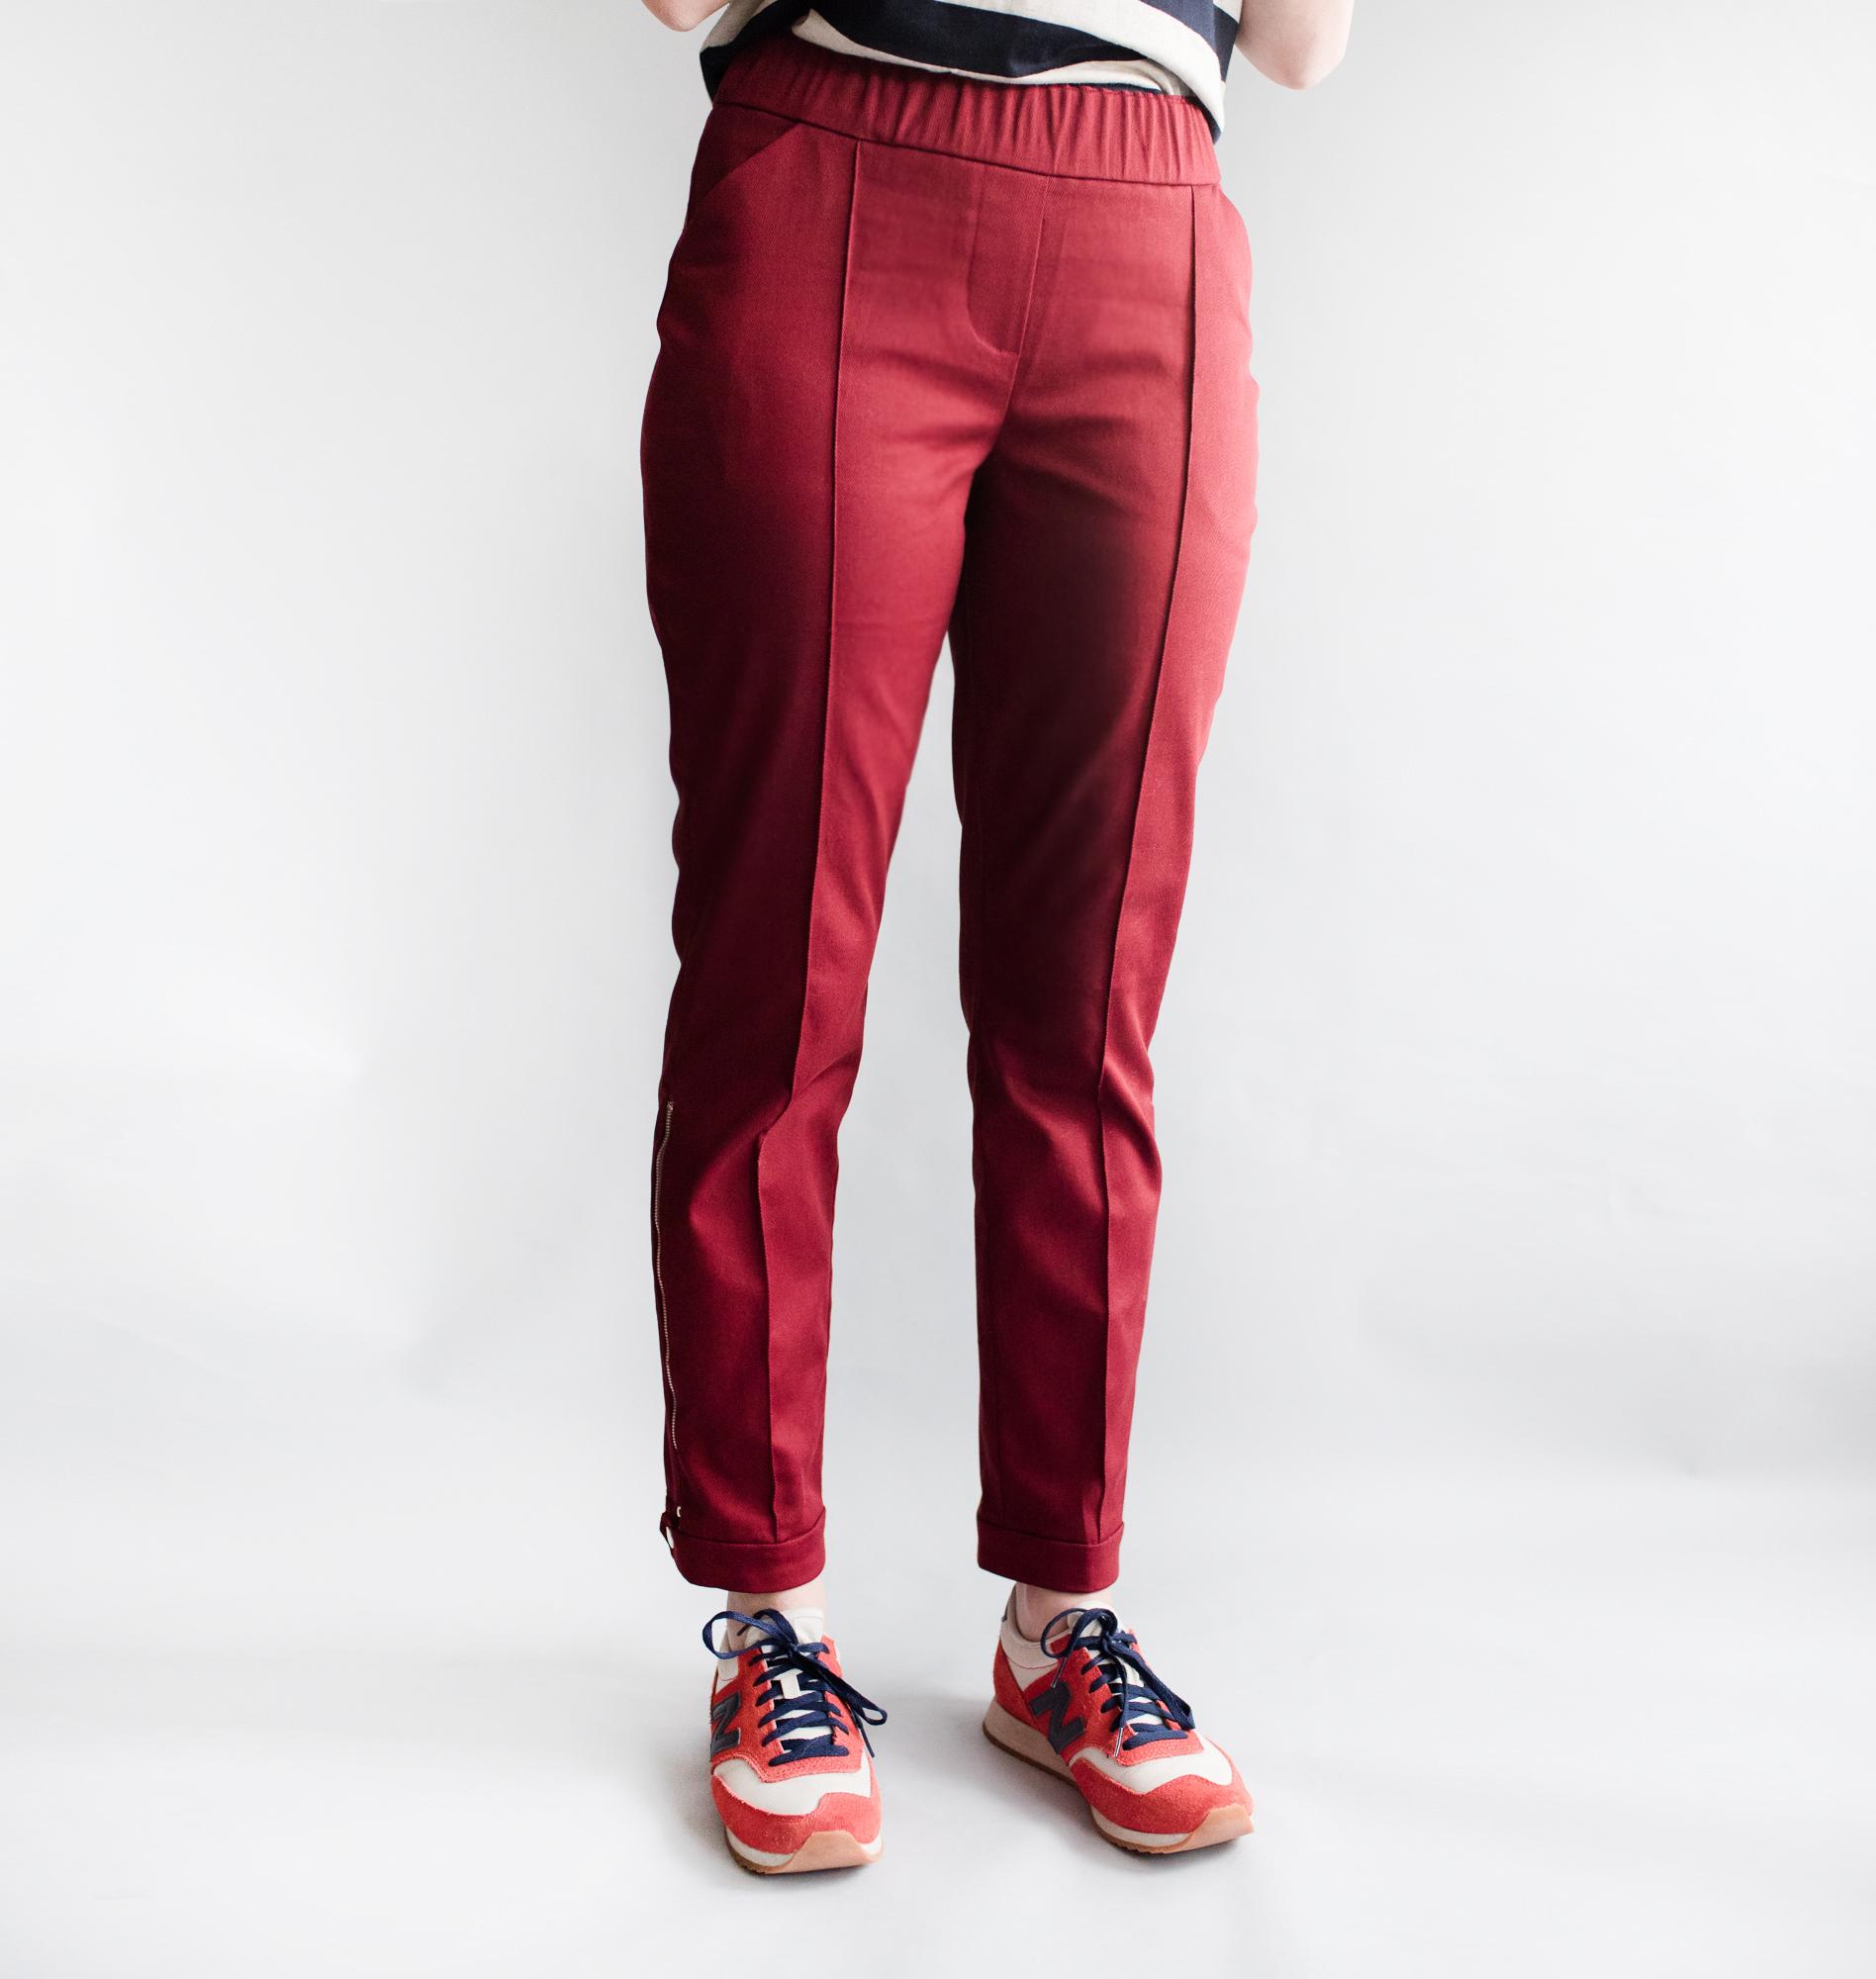 robinson-pdf-sewing-trouser06.jpg